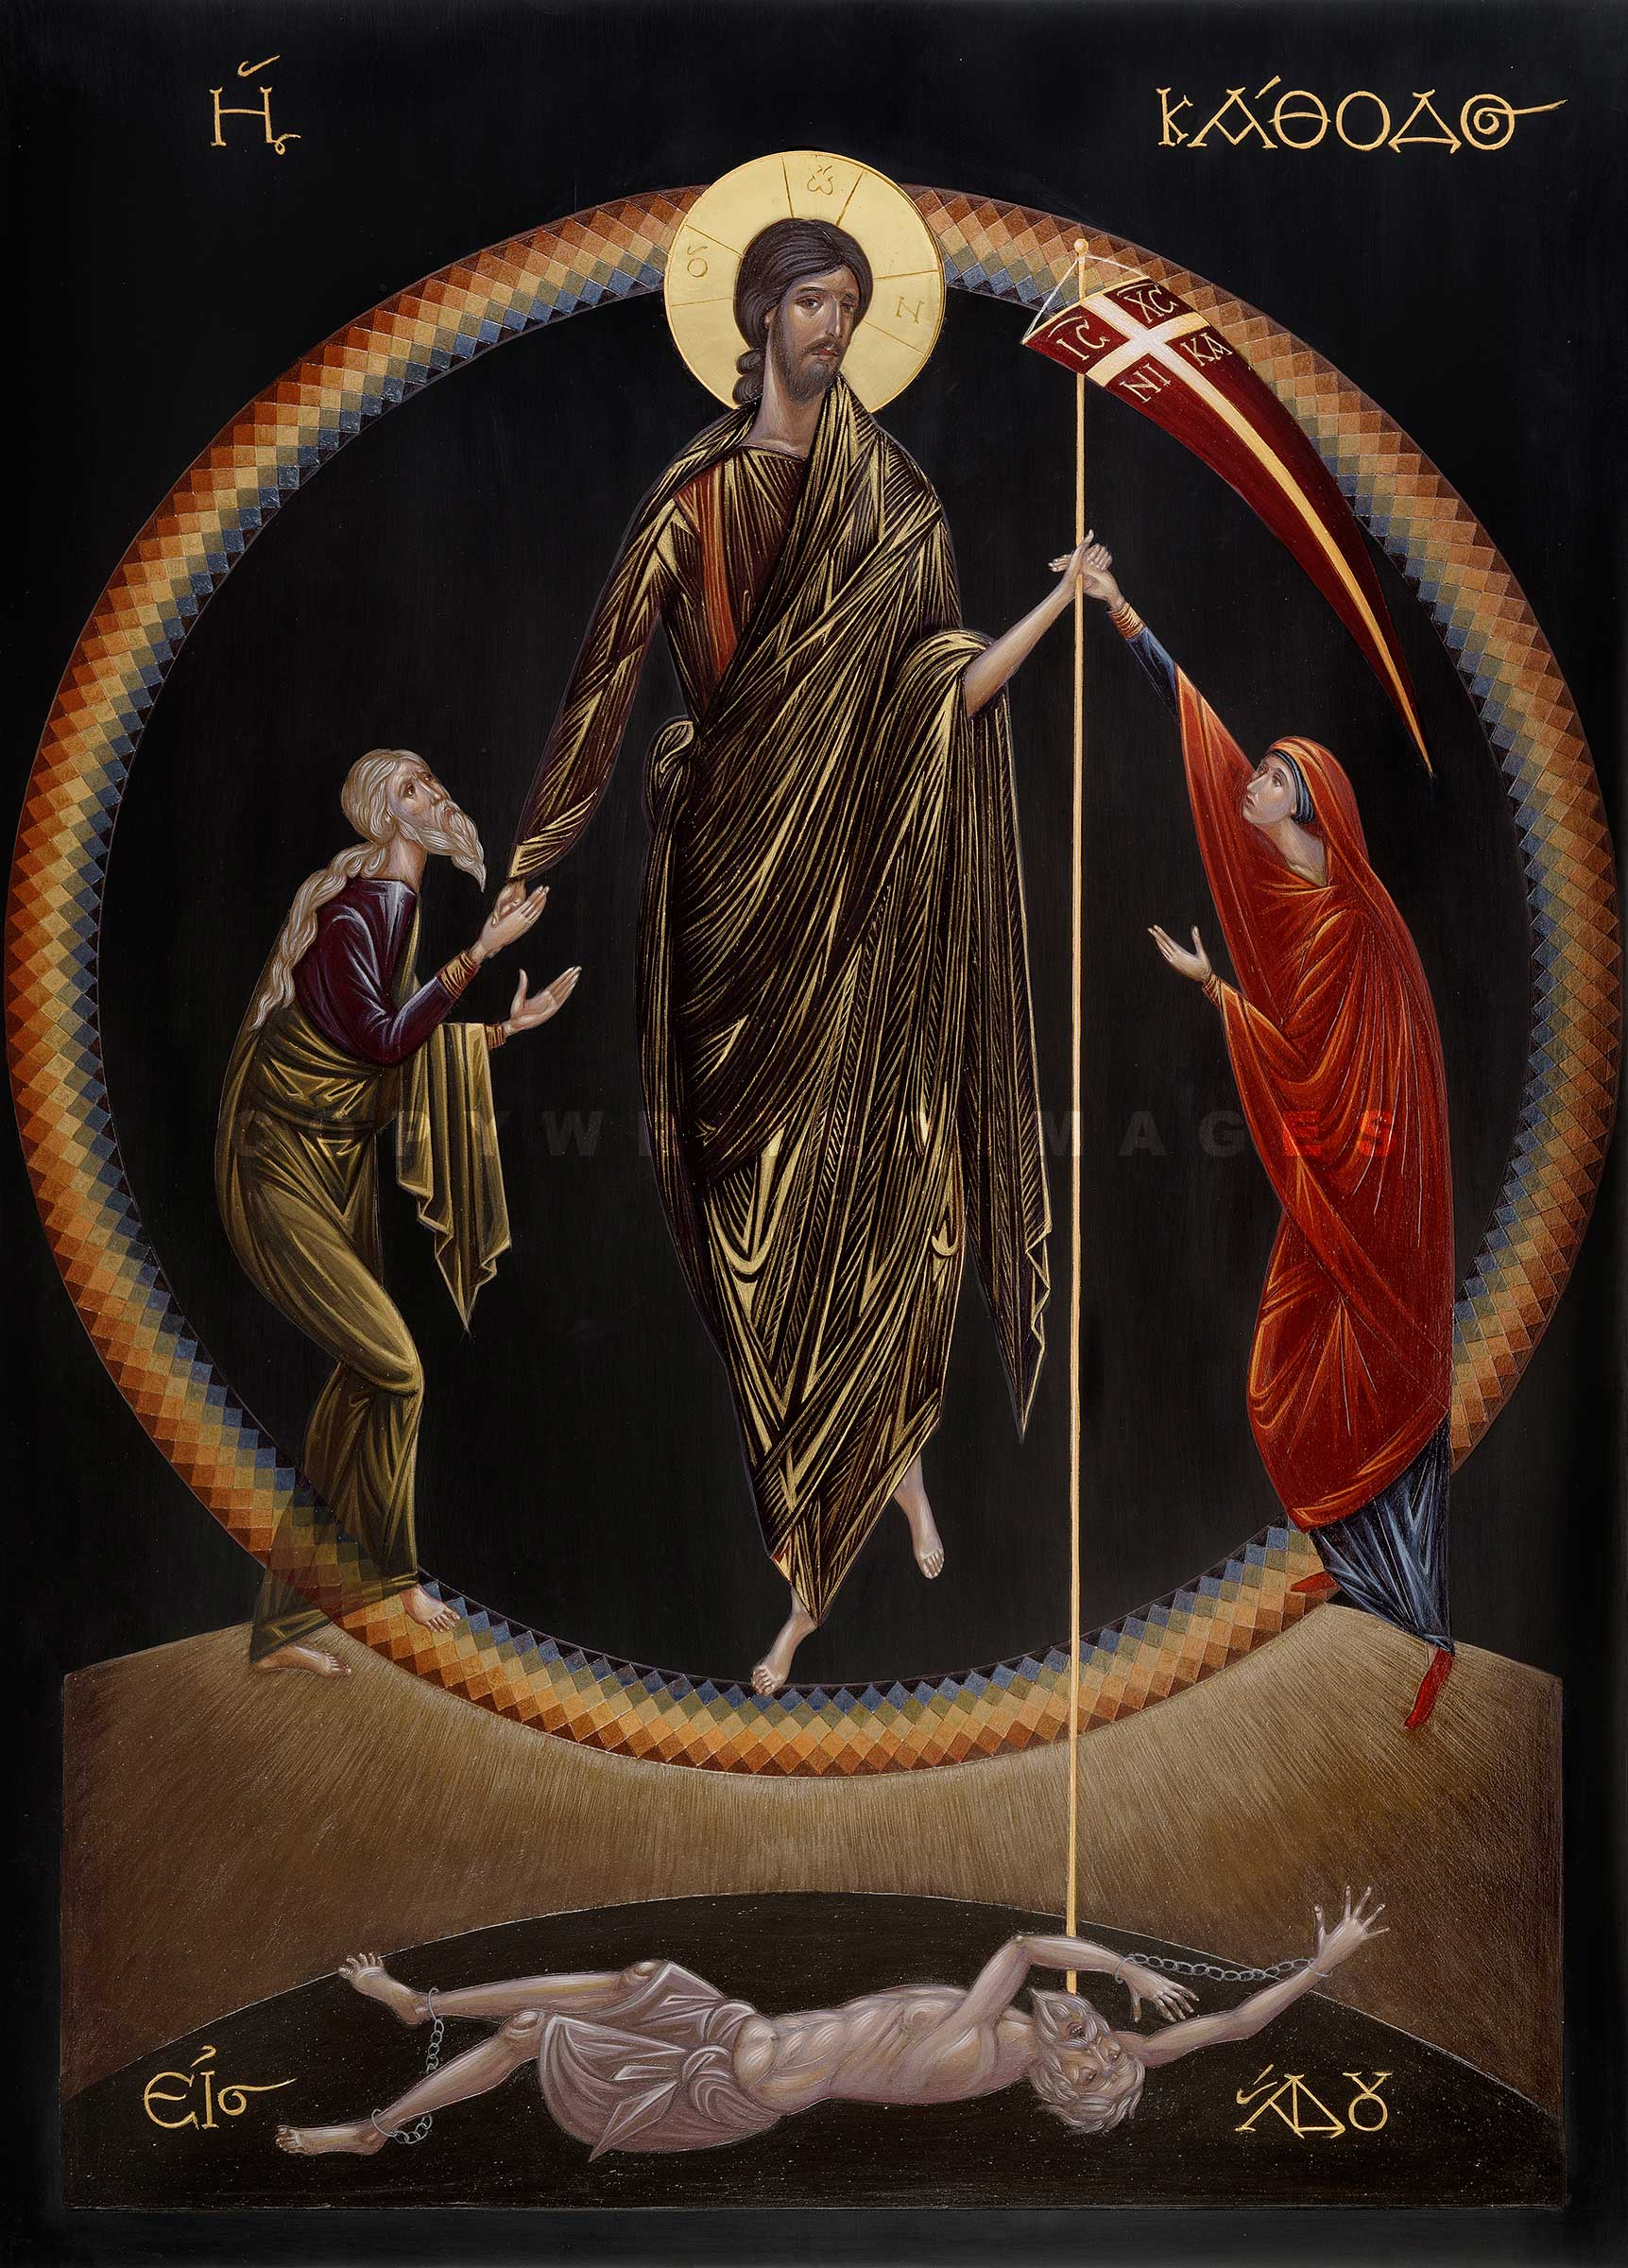 Resurrection by Dimosthenis Avramidis